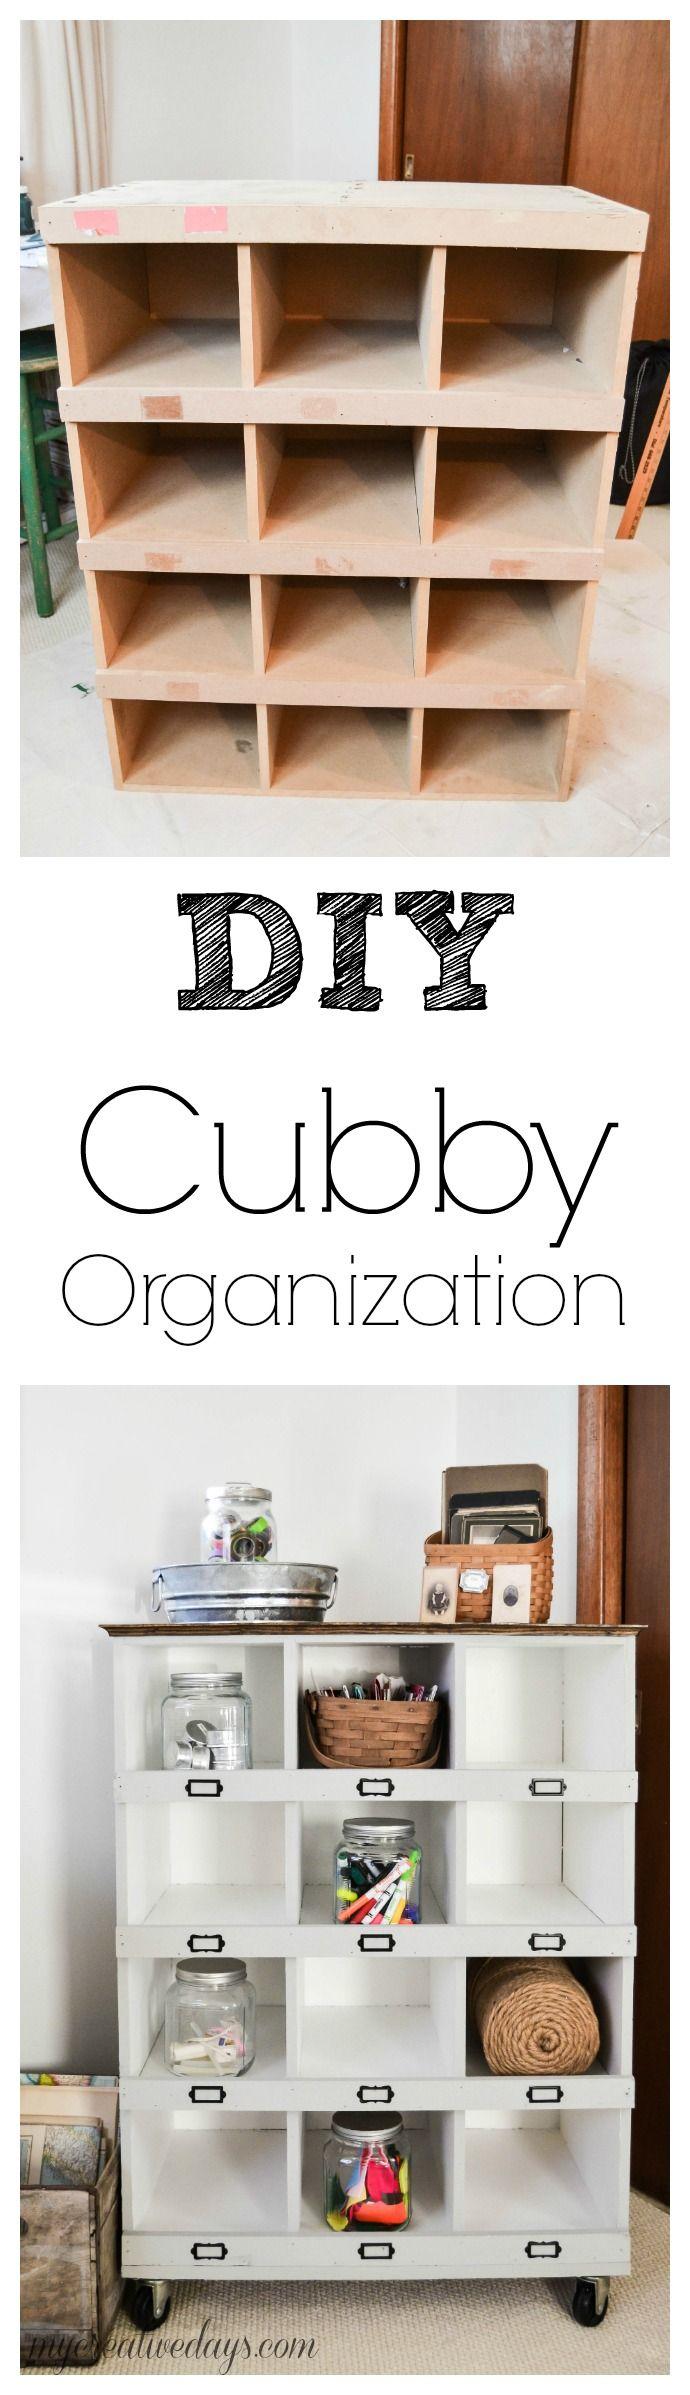 221 best Garage & Home Organization images on Pinterest | Carpentry ...